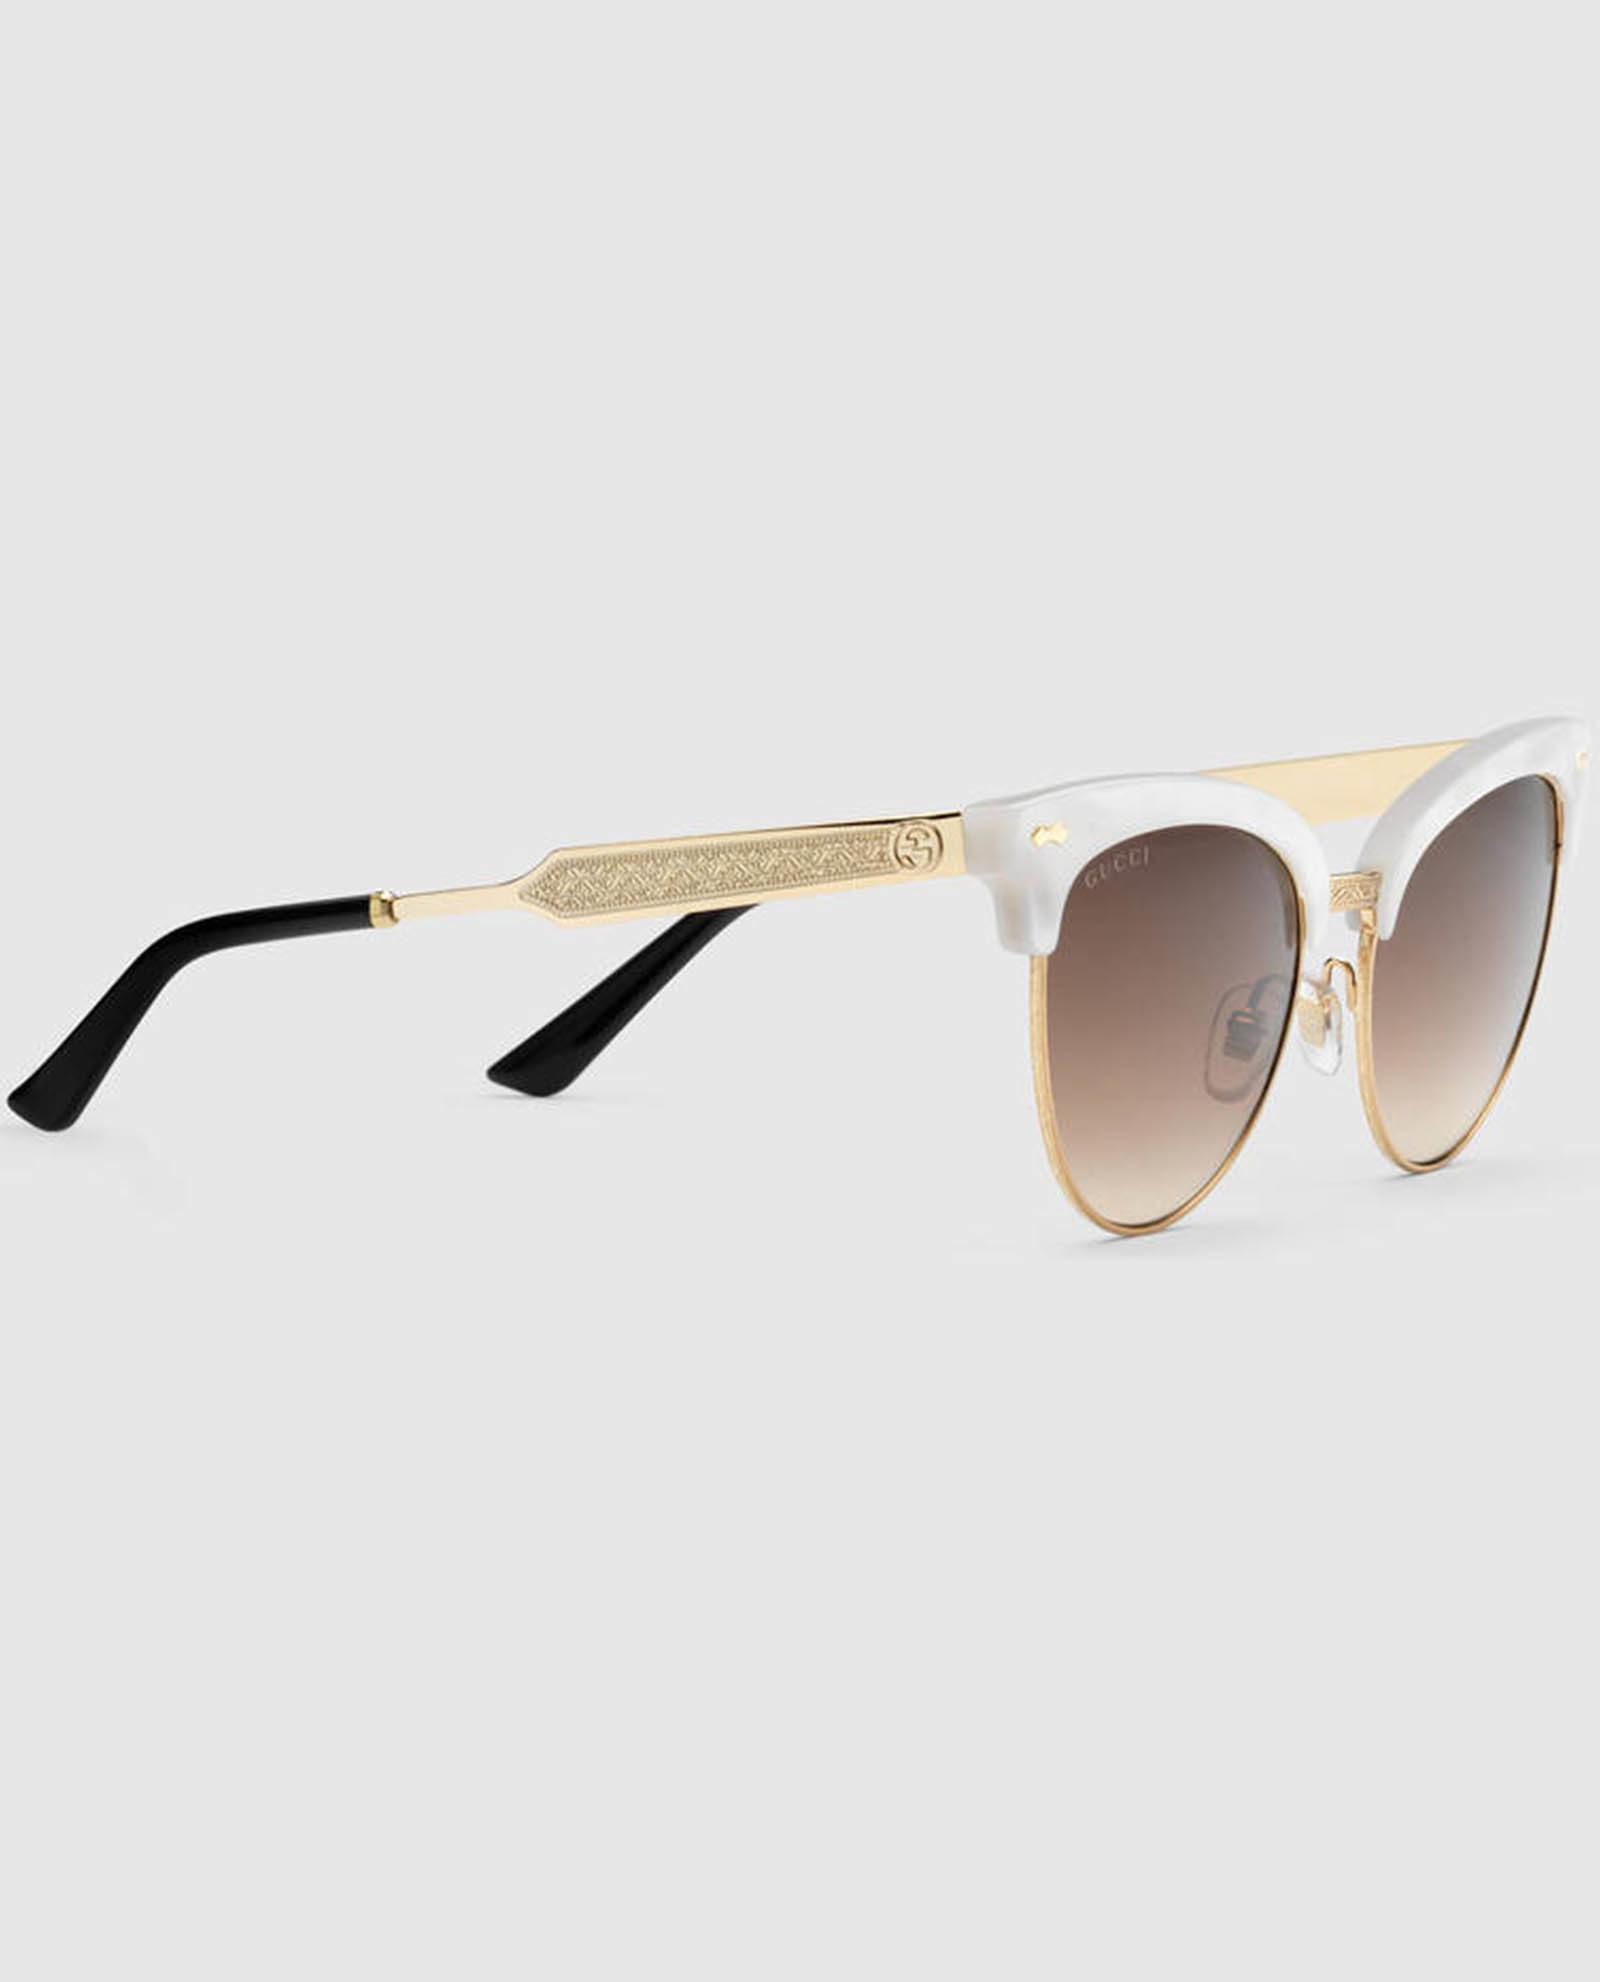 https://www.polydoruoptika.gr/wp-content/uploads/2018/03/434072_I3330_9825_002_100_0000_Light-Cat-eye-acetate-and-metal-sunglasses-GUCCI-WOMAN.jpg